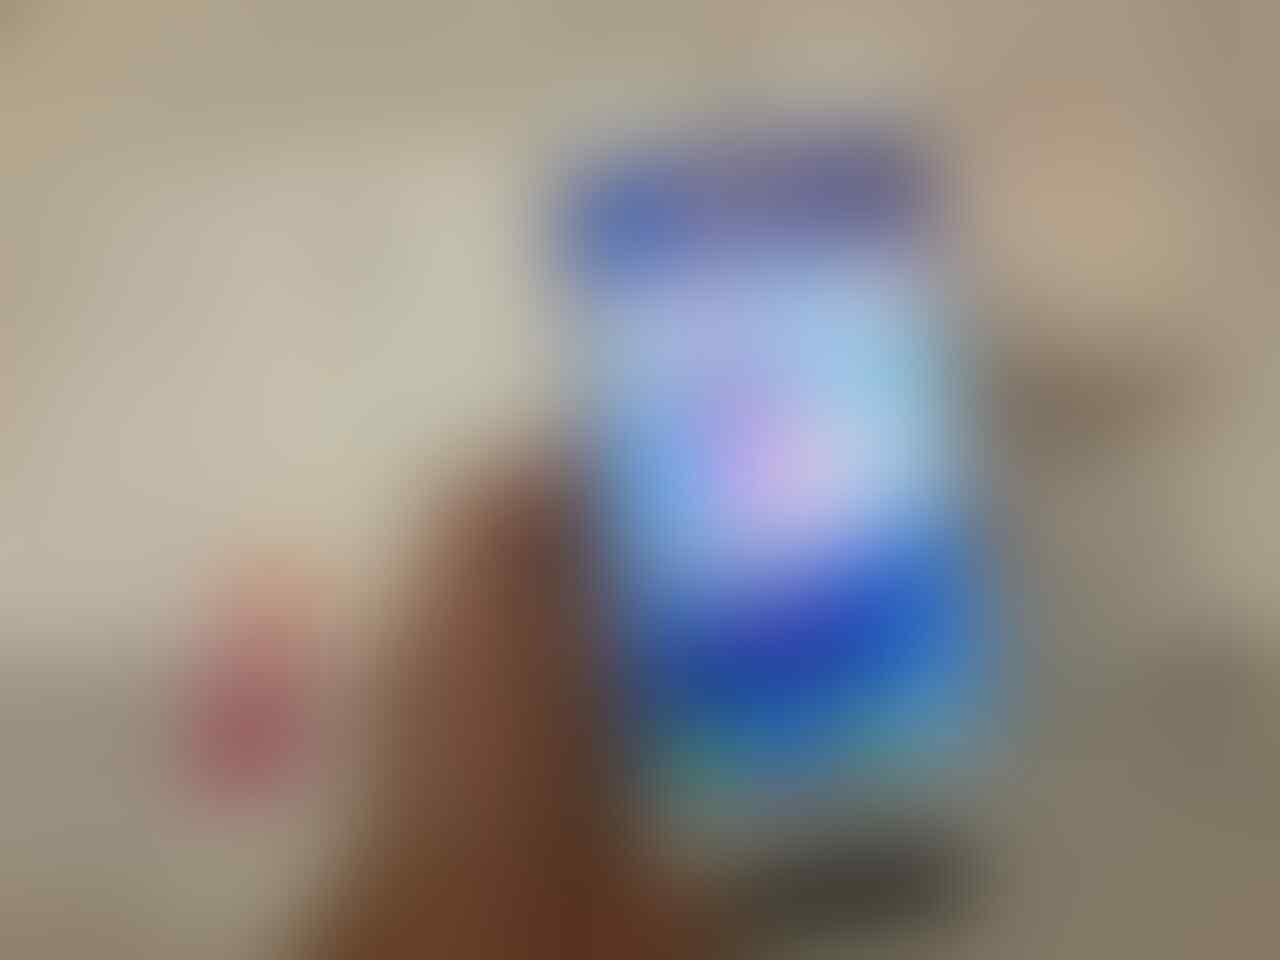 IPHONE 8 PLUS GOLD 64GB FULLSET GARANSI SEPTEMBER 2018 MURAAH 10900 SAJA [MALANG]